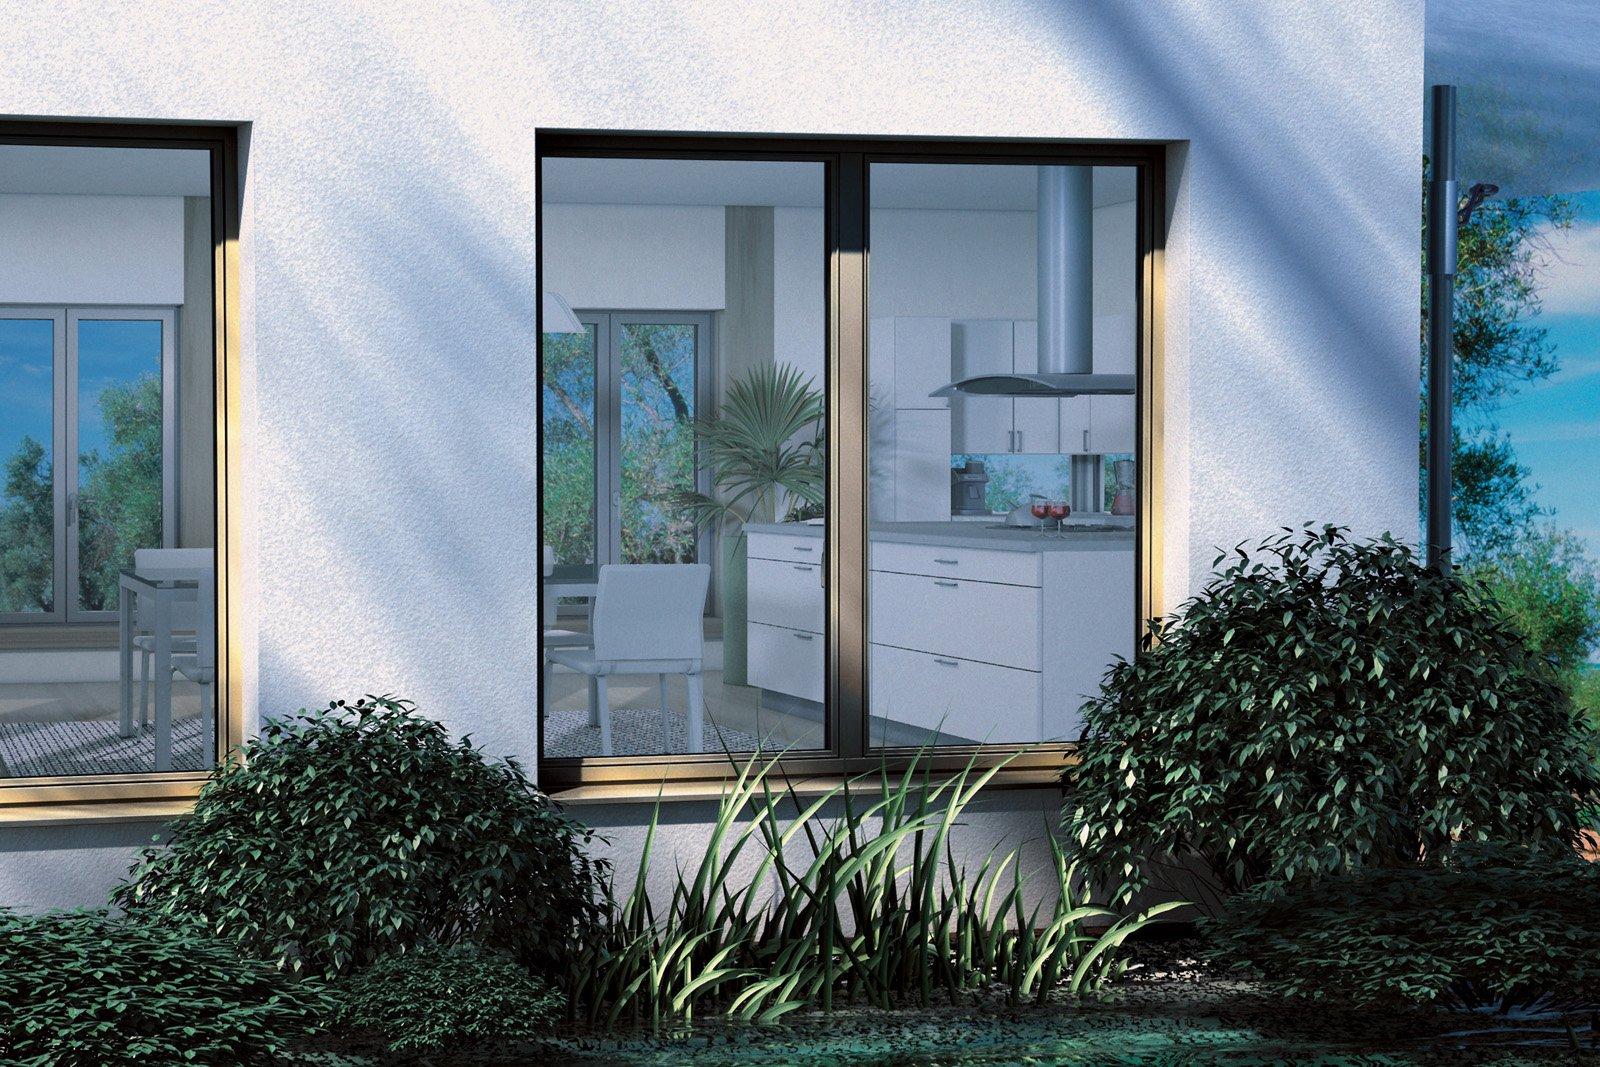 Ingrandire una finestra cose di casa - Serranda porta finestra ...